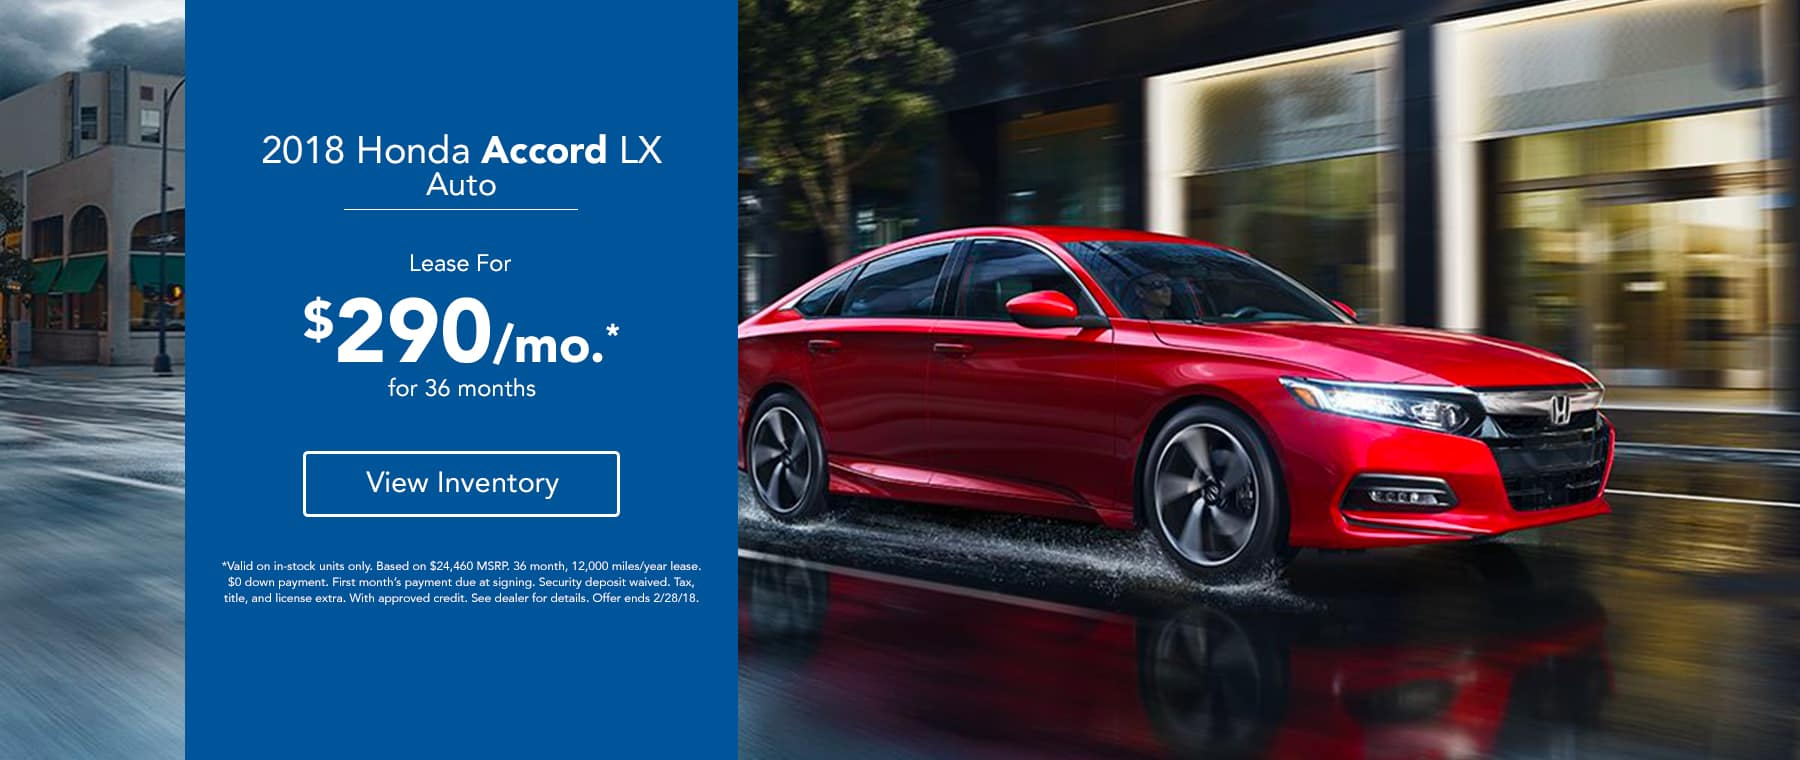 2018 Honda Accord LX - Lease for 299/mo